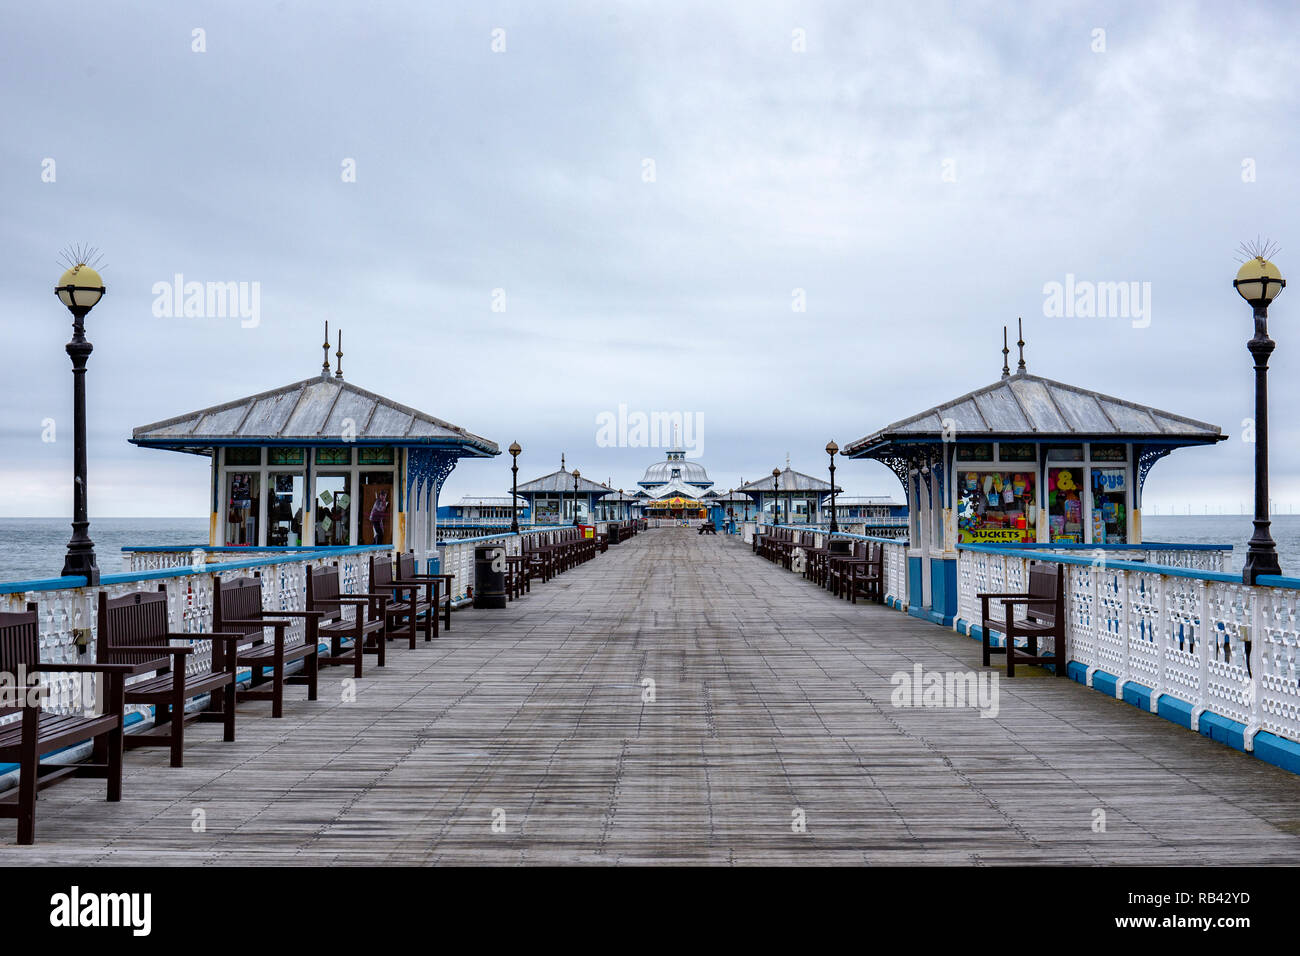 Deserted pier in Llandudno Wales UK - Stock Image